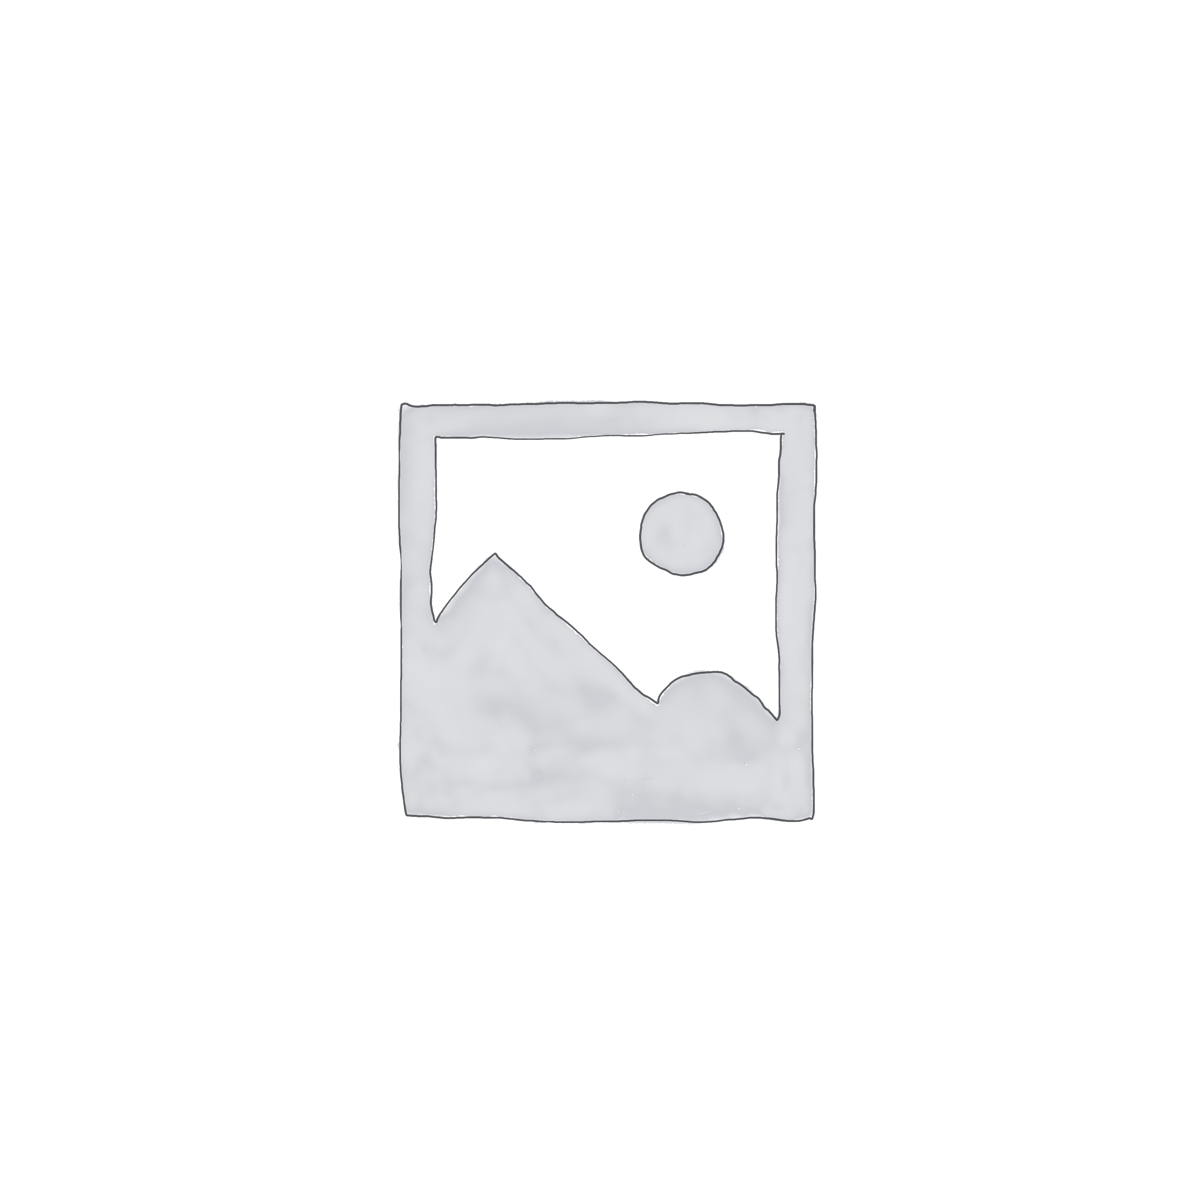 Unitronics – ANALOG I/O UNIT, 8 AI